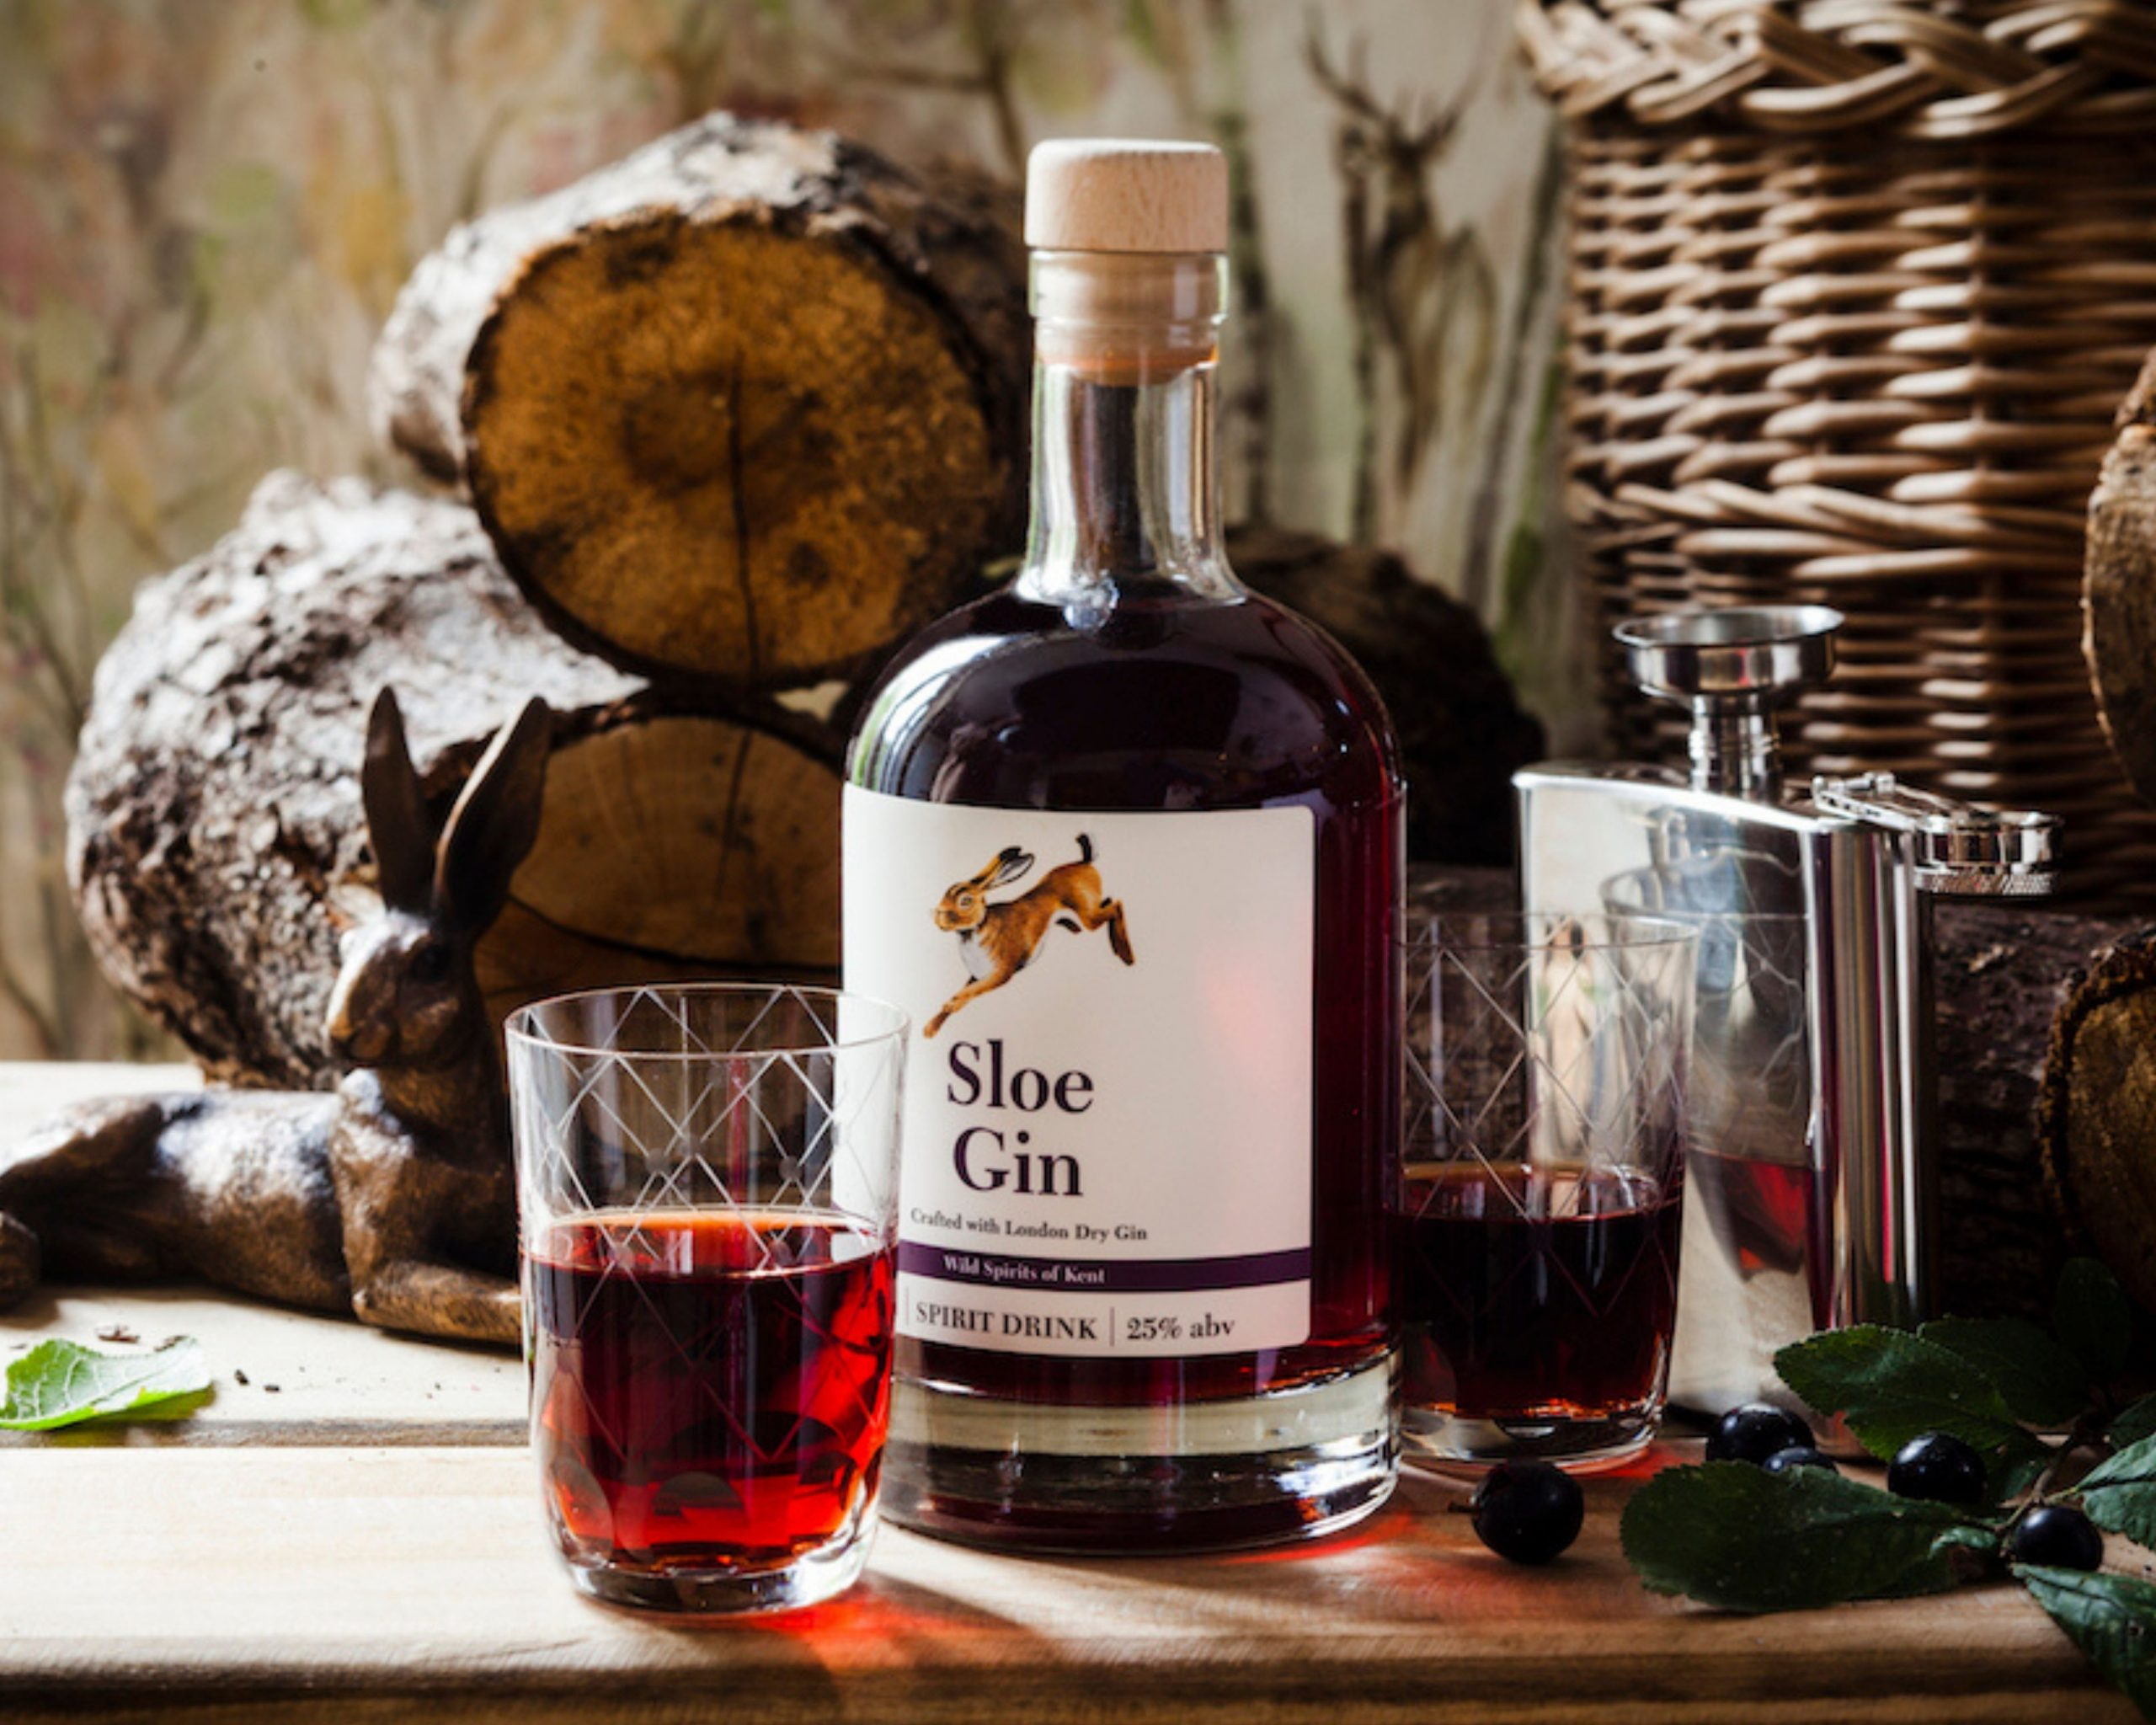 Bottle of Sloe Gin from Kent